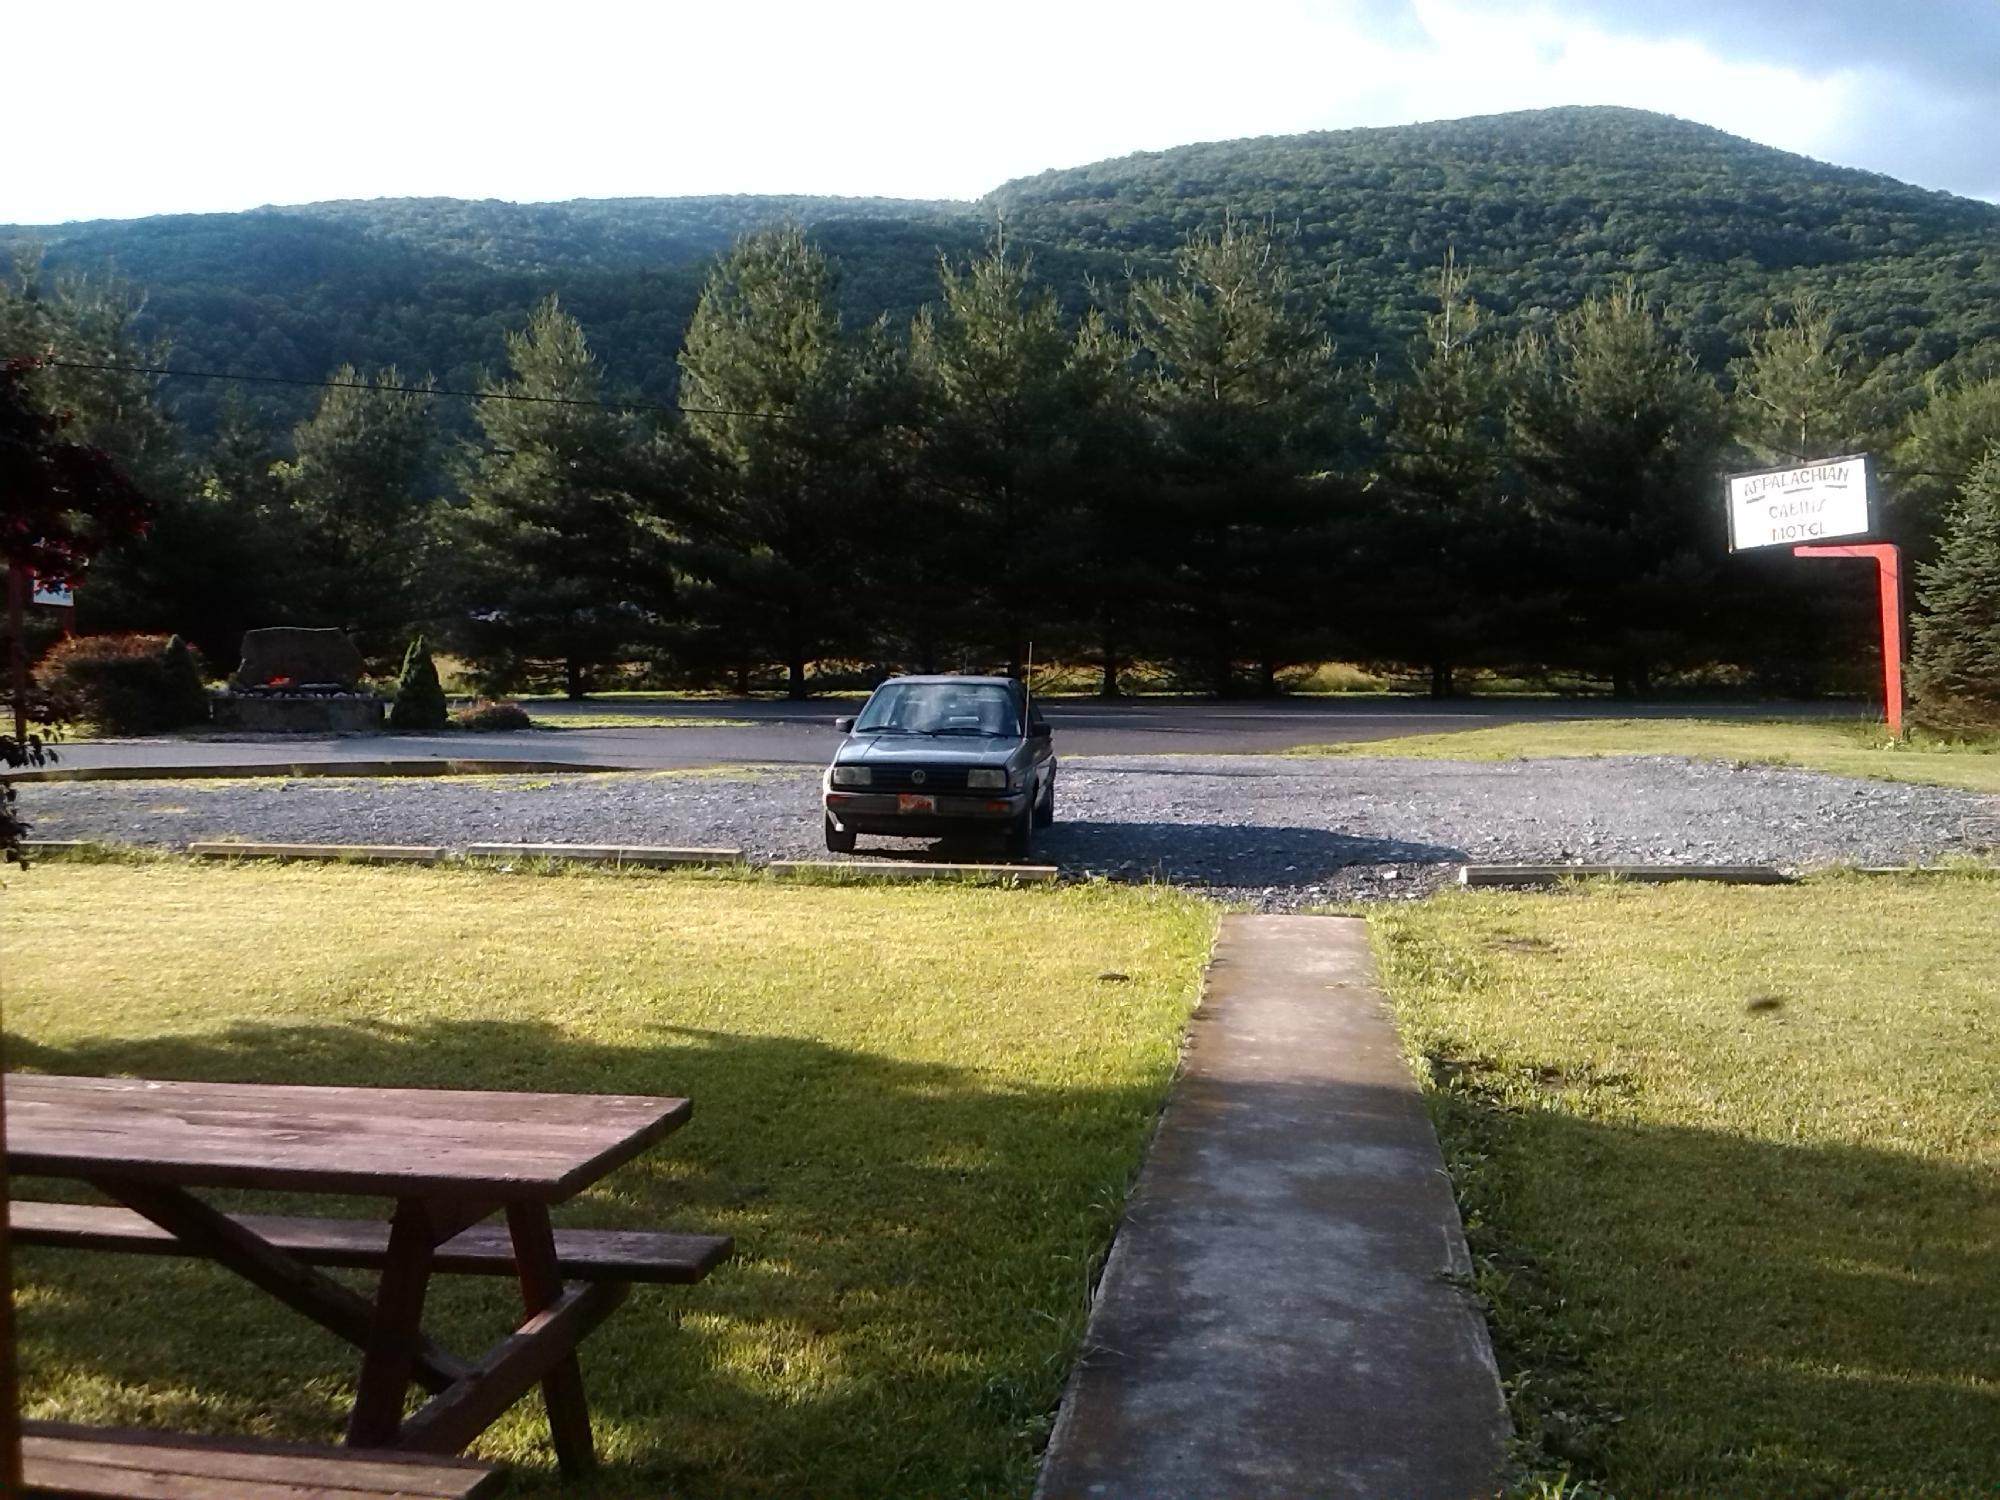 Appalachian Cabins